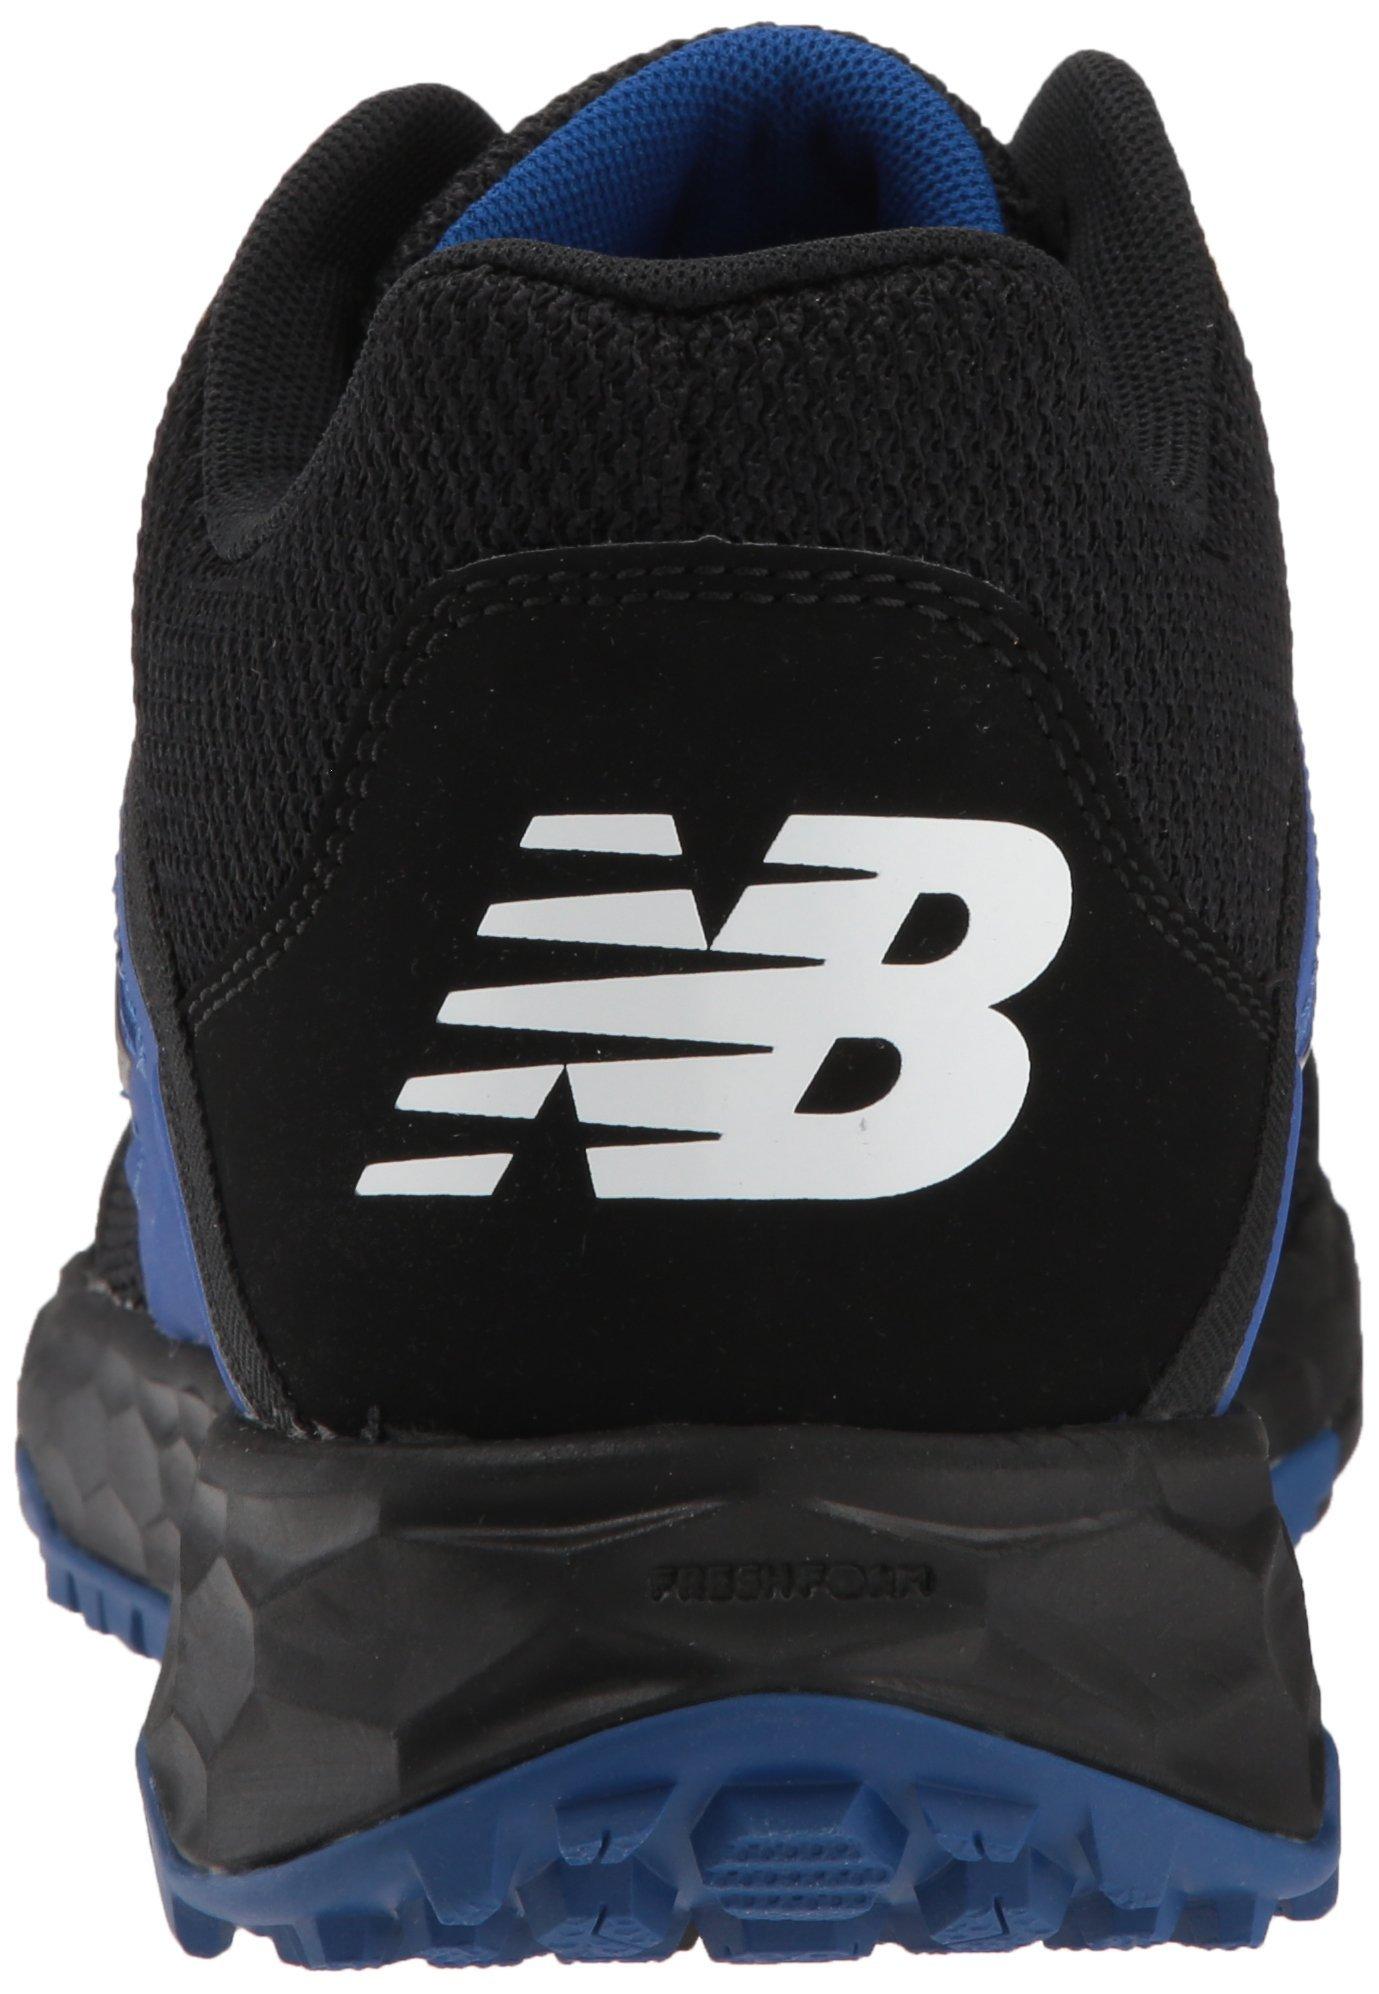 New Balance Men's 3000v4 Turf Baseball Shoe, Black/Blue, 5 D US by New Balance (Image #2)